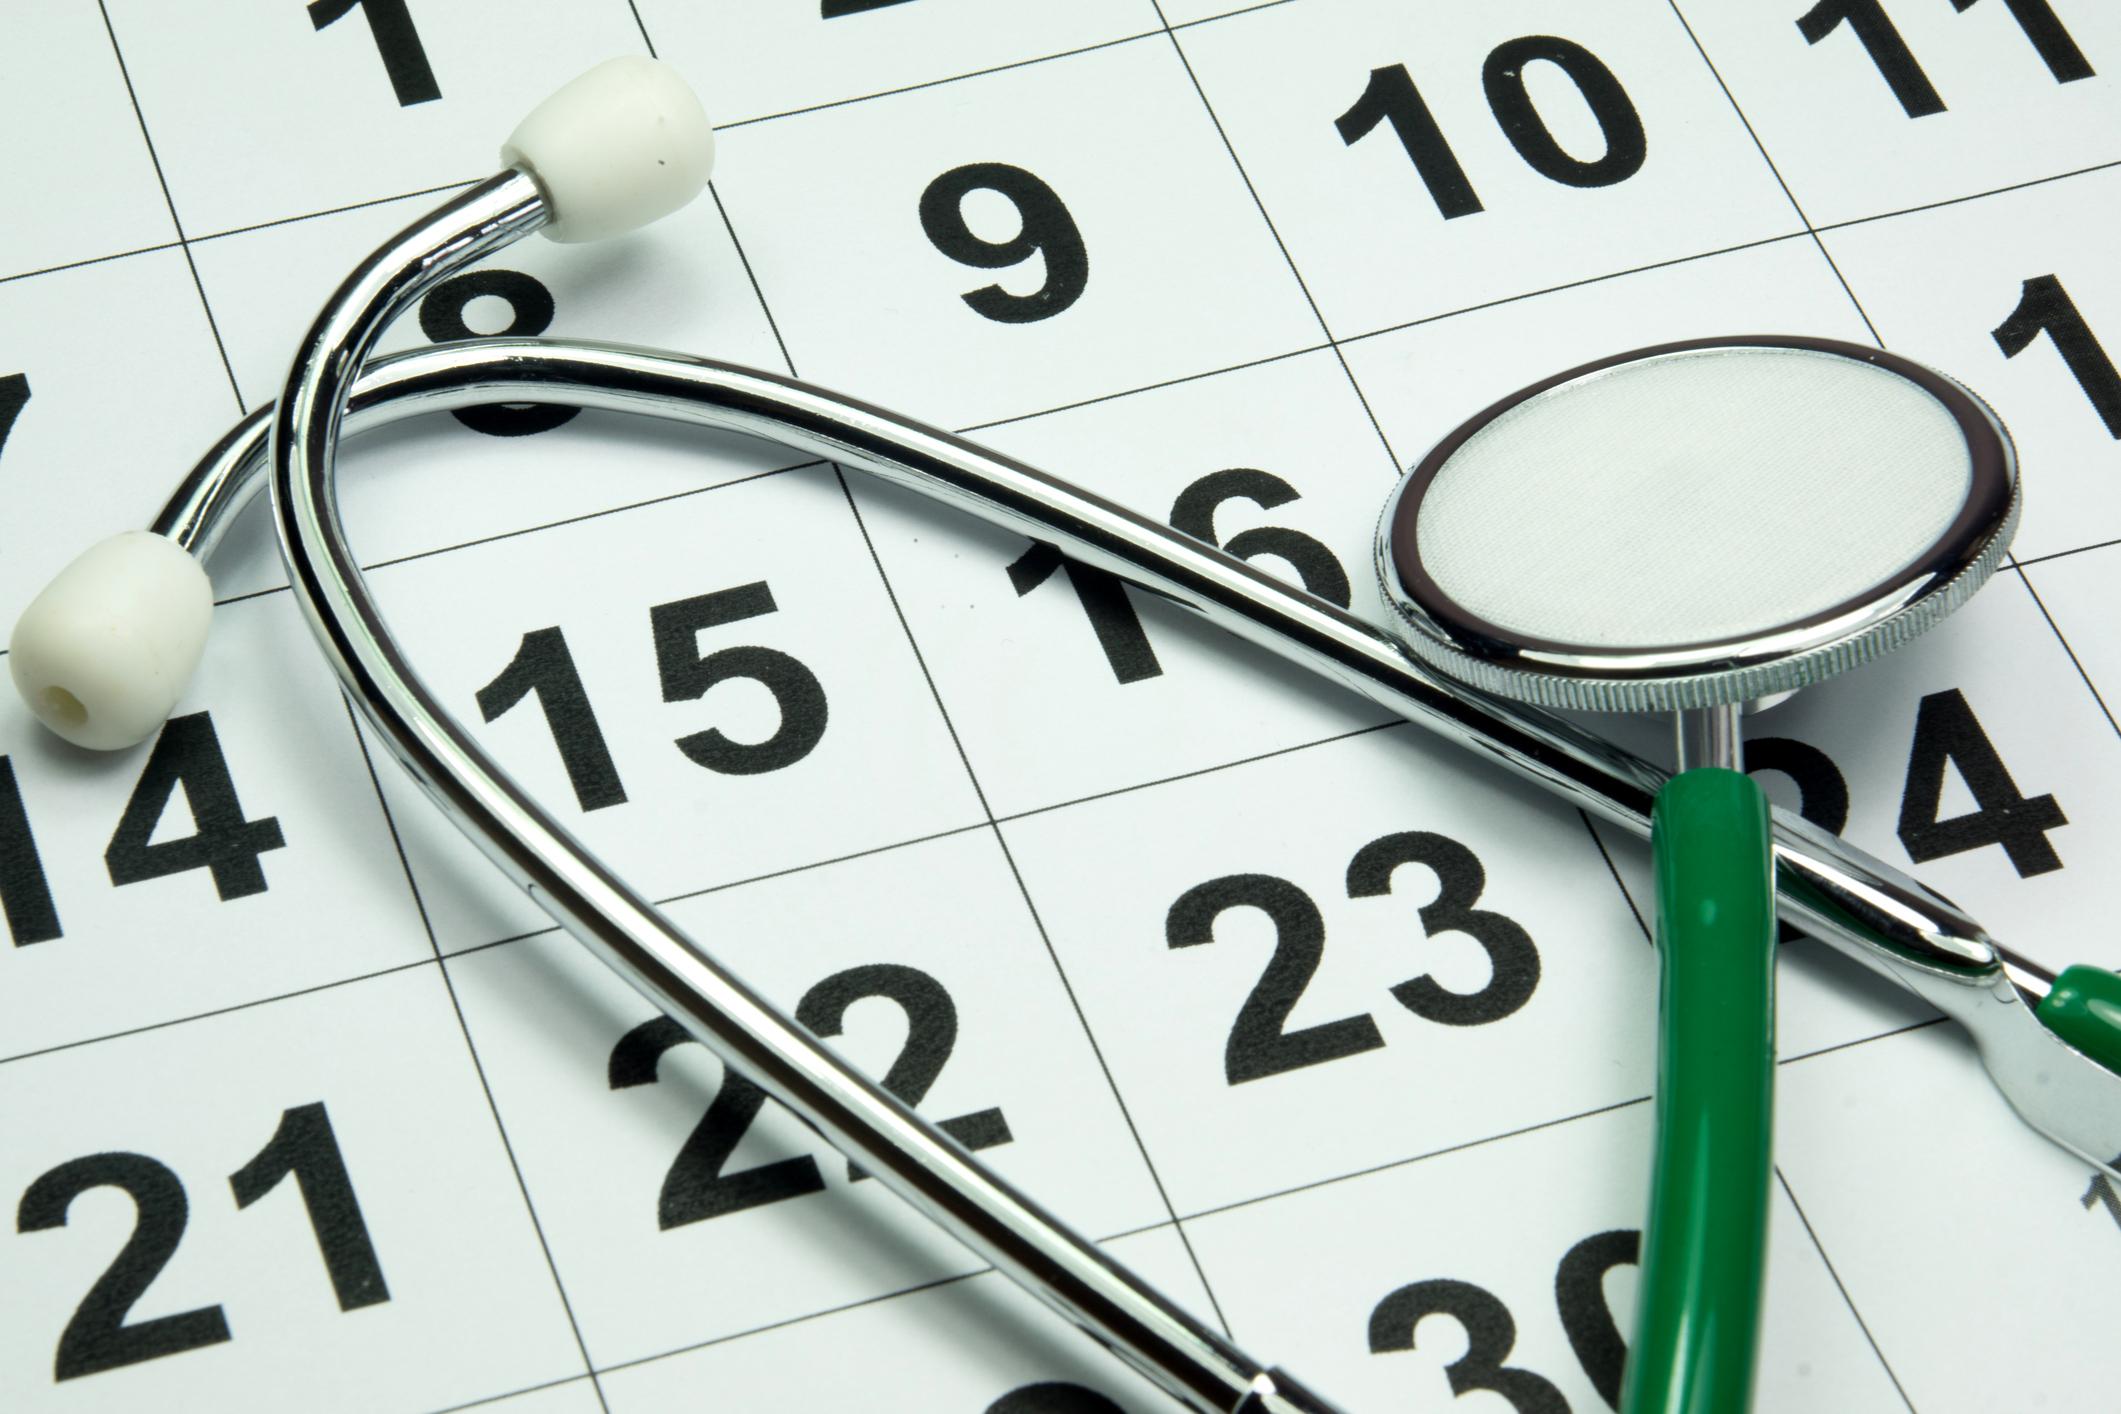 A stethoscope lying atop a calendar.